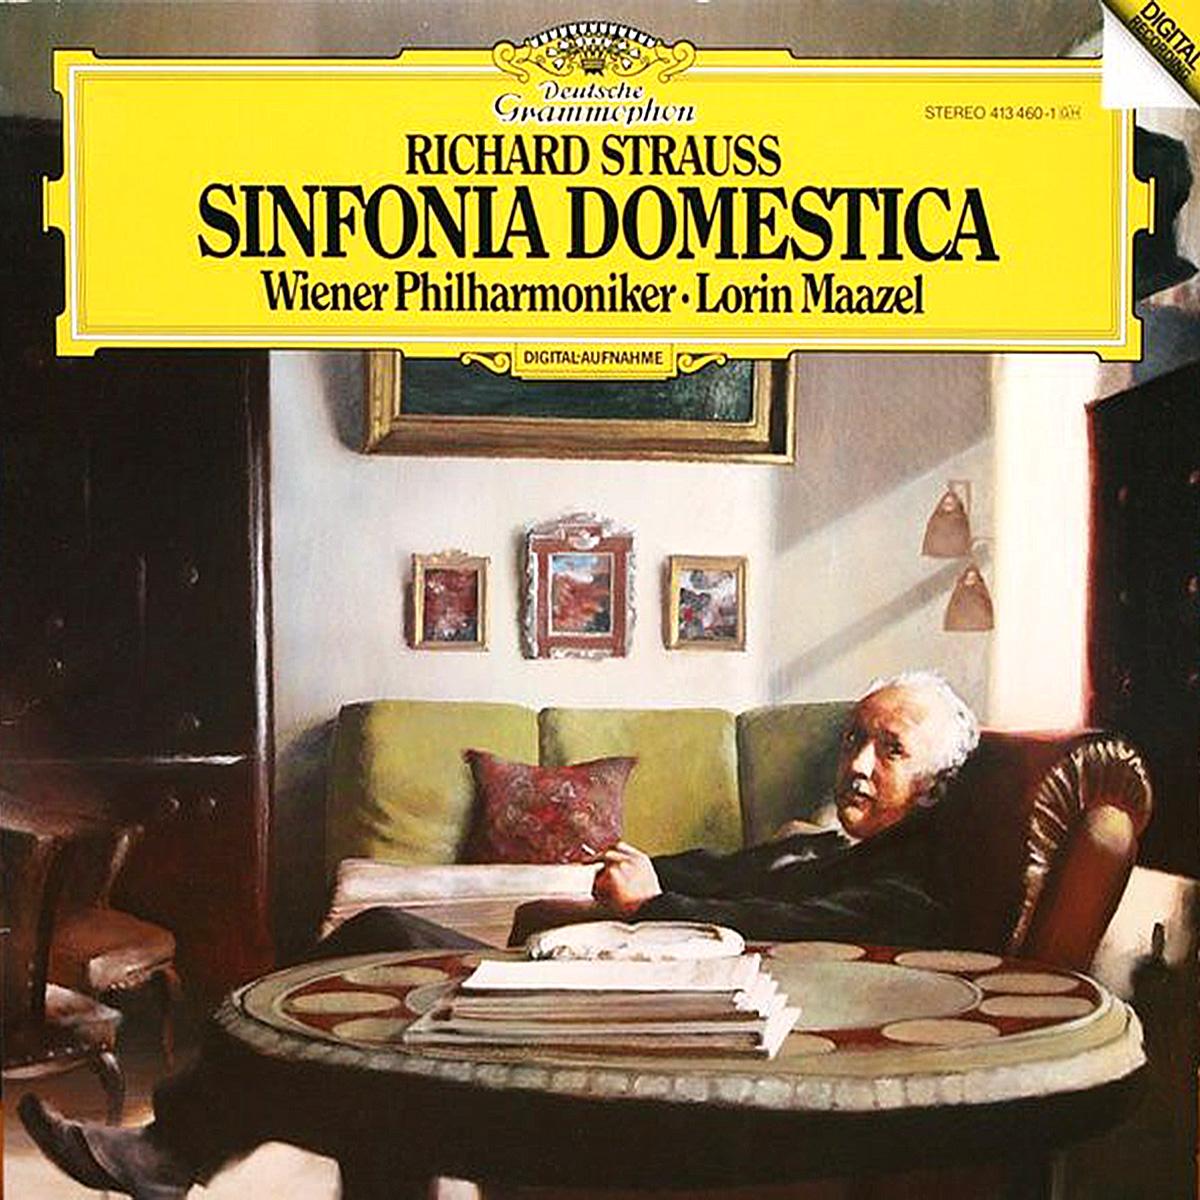 DGG 413 460 Strauss Sinfonia Domestica Maazel DGG Digital Aufnahme